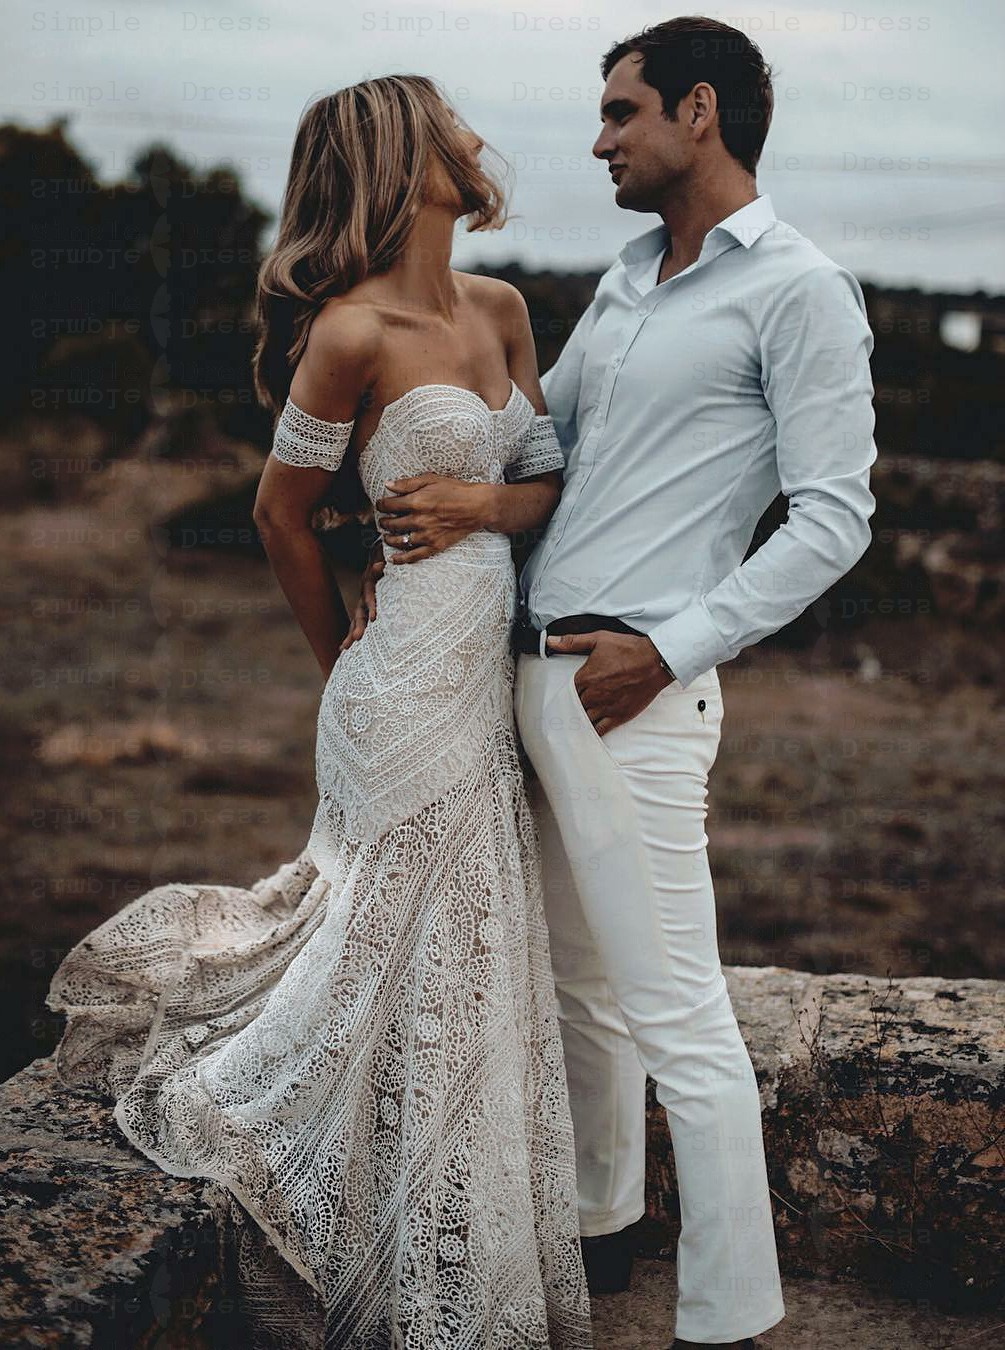 Mermaid Sweetheart Ivory Lace Beach Boho Wedding Dress Wedding Dresses 199 99 Simple Dress Com